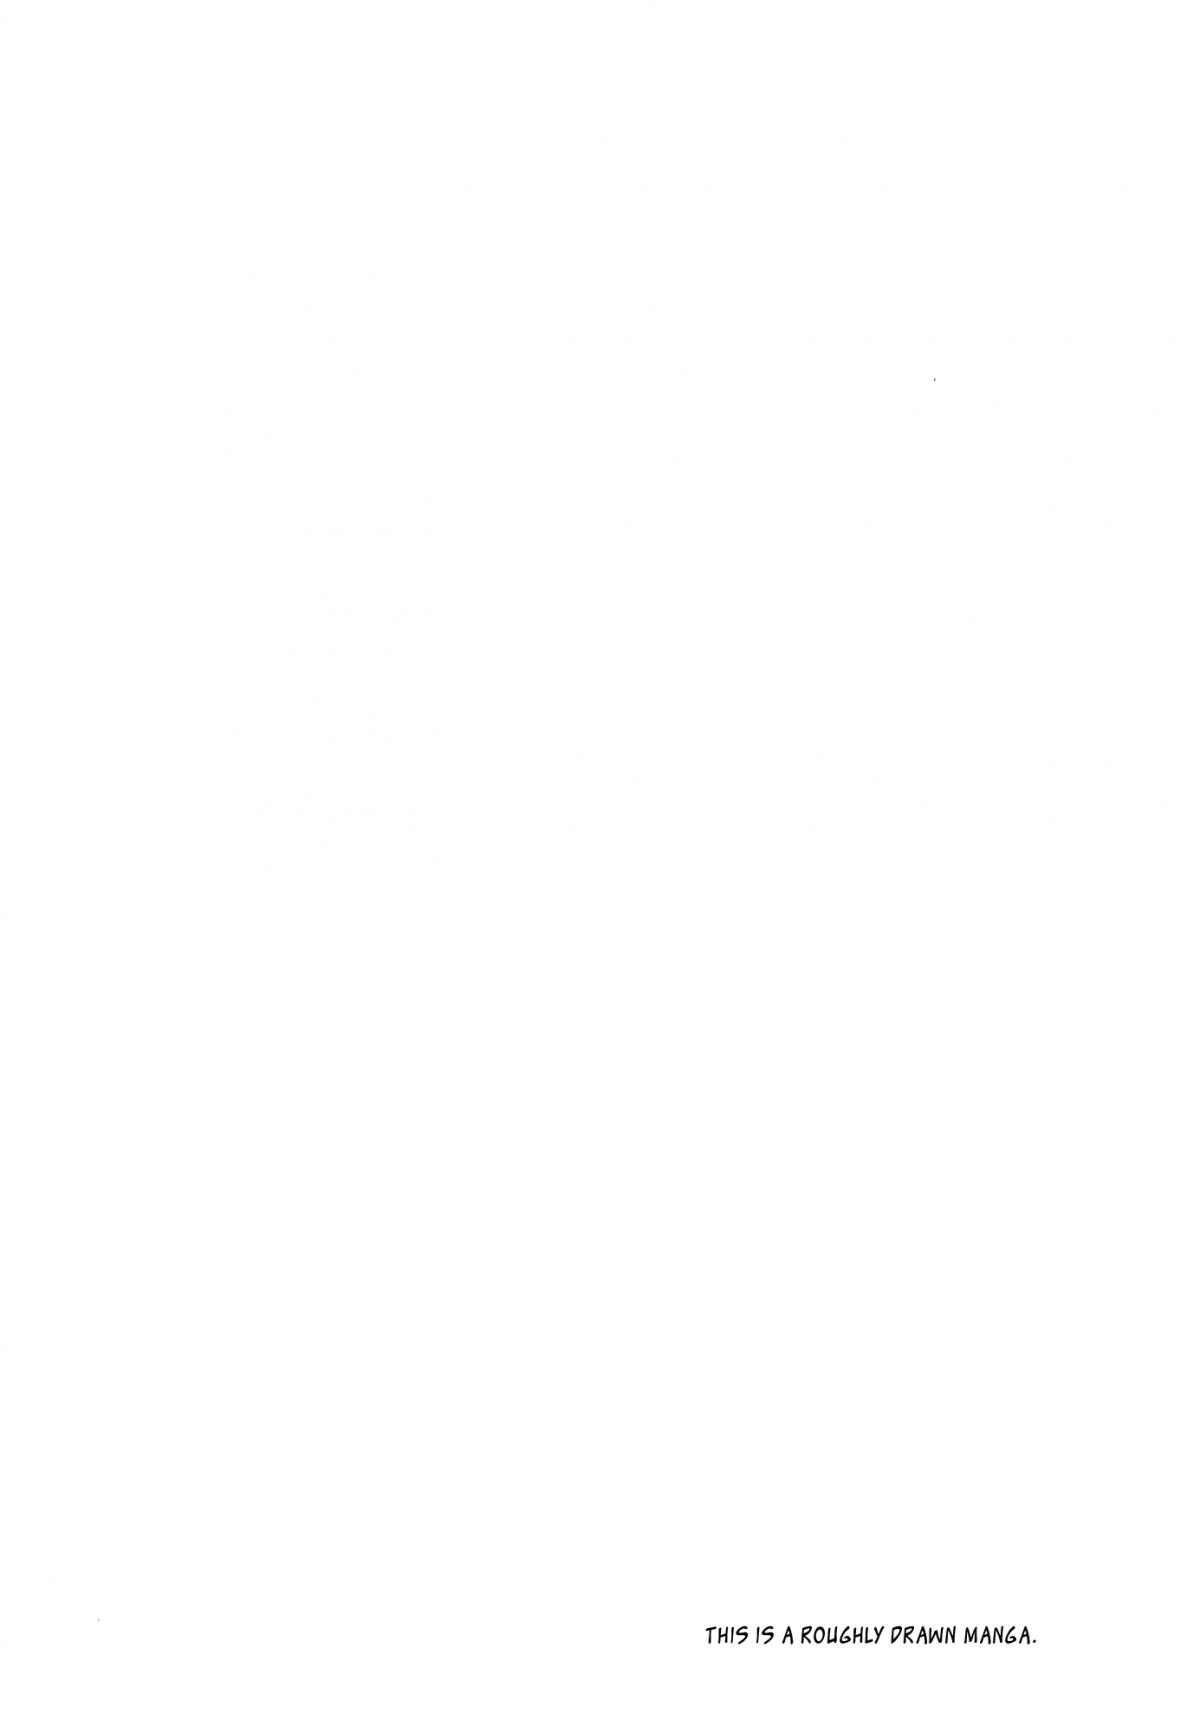 HentaiVN.net - Ảnh 3 - 艇母の見る夢 - Oneshot